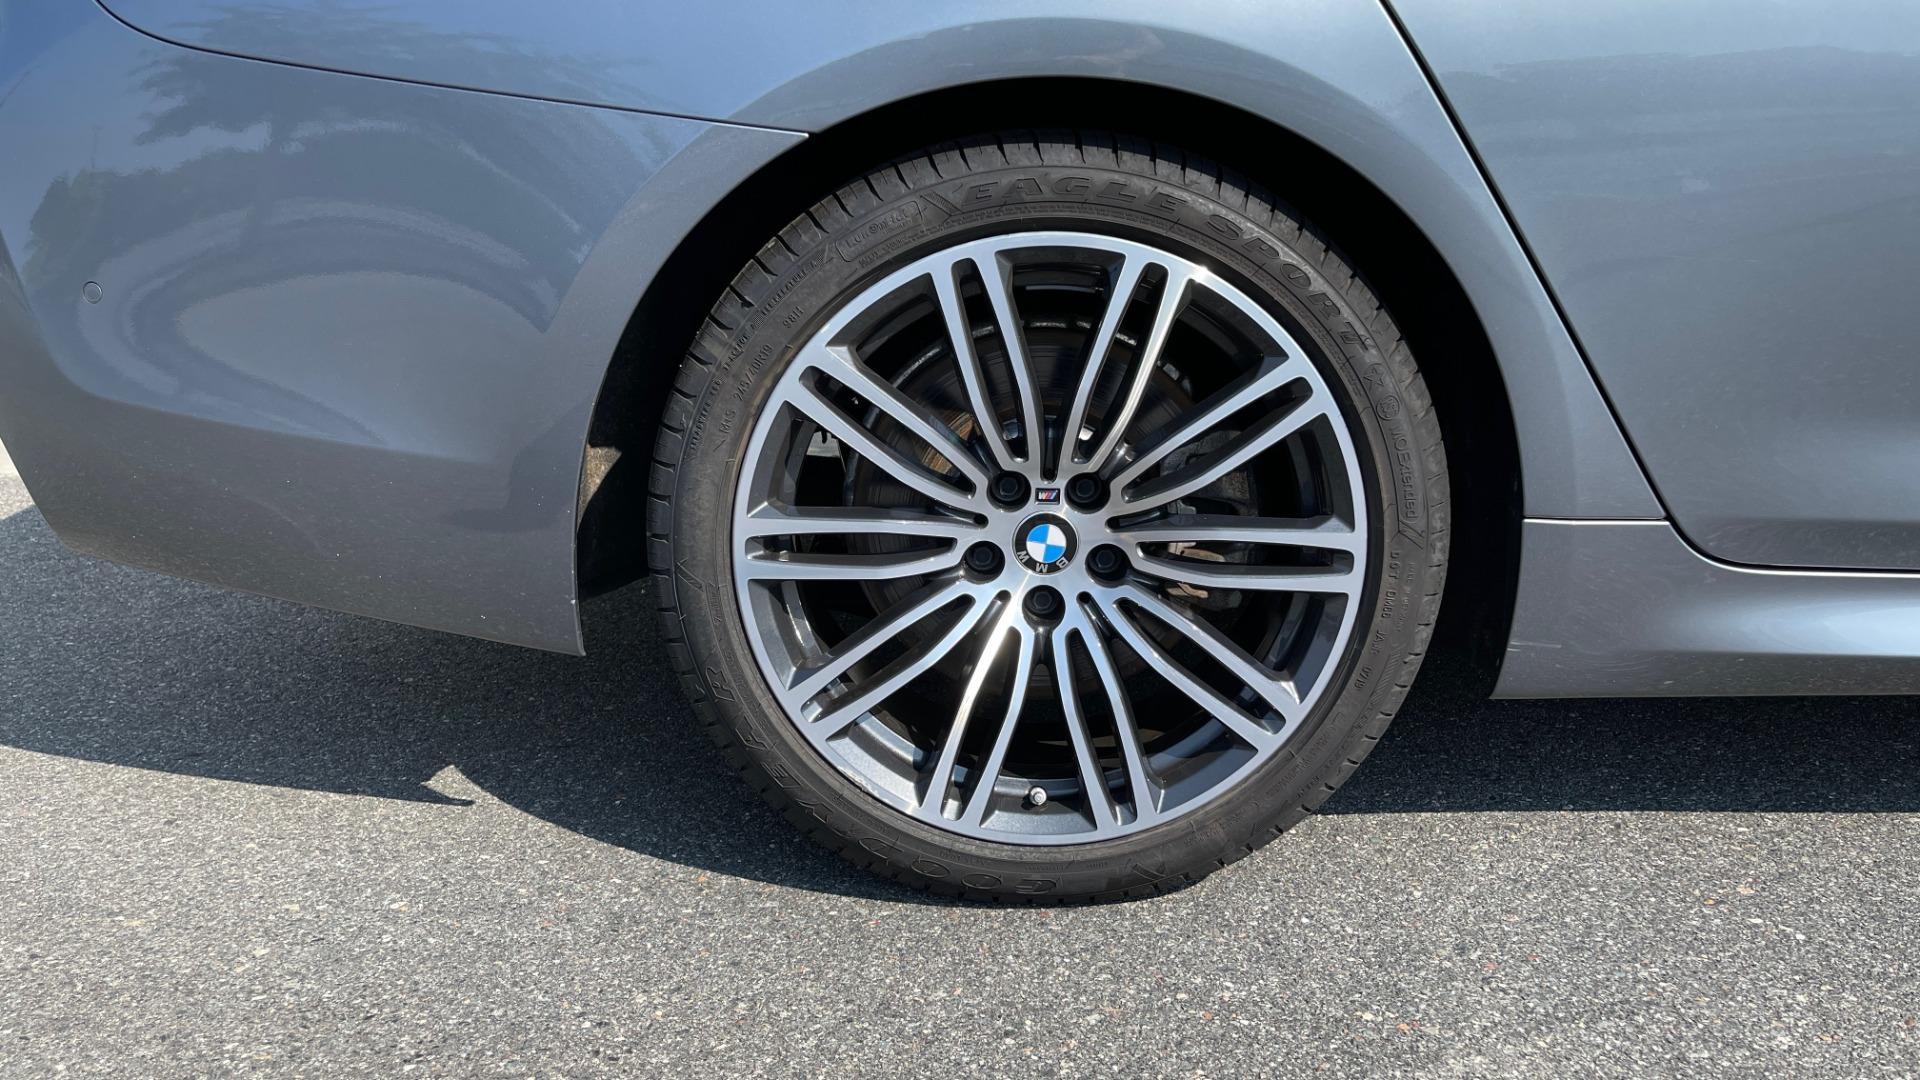 Used 2018 BMW 5 SERIES 540I XDRIVE M-SPORT / DRVR ASST / PDC / APPLE / HUD / H/K SND for sale $42,795 at Formula Imports in Charlotte NC 28227 71